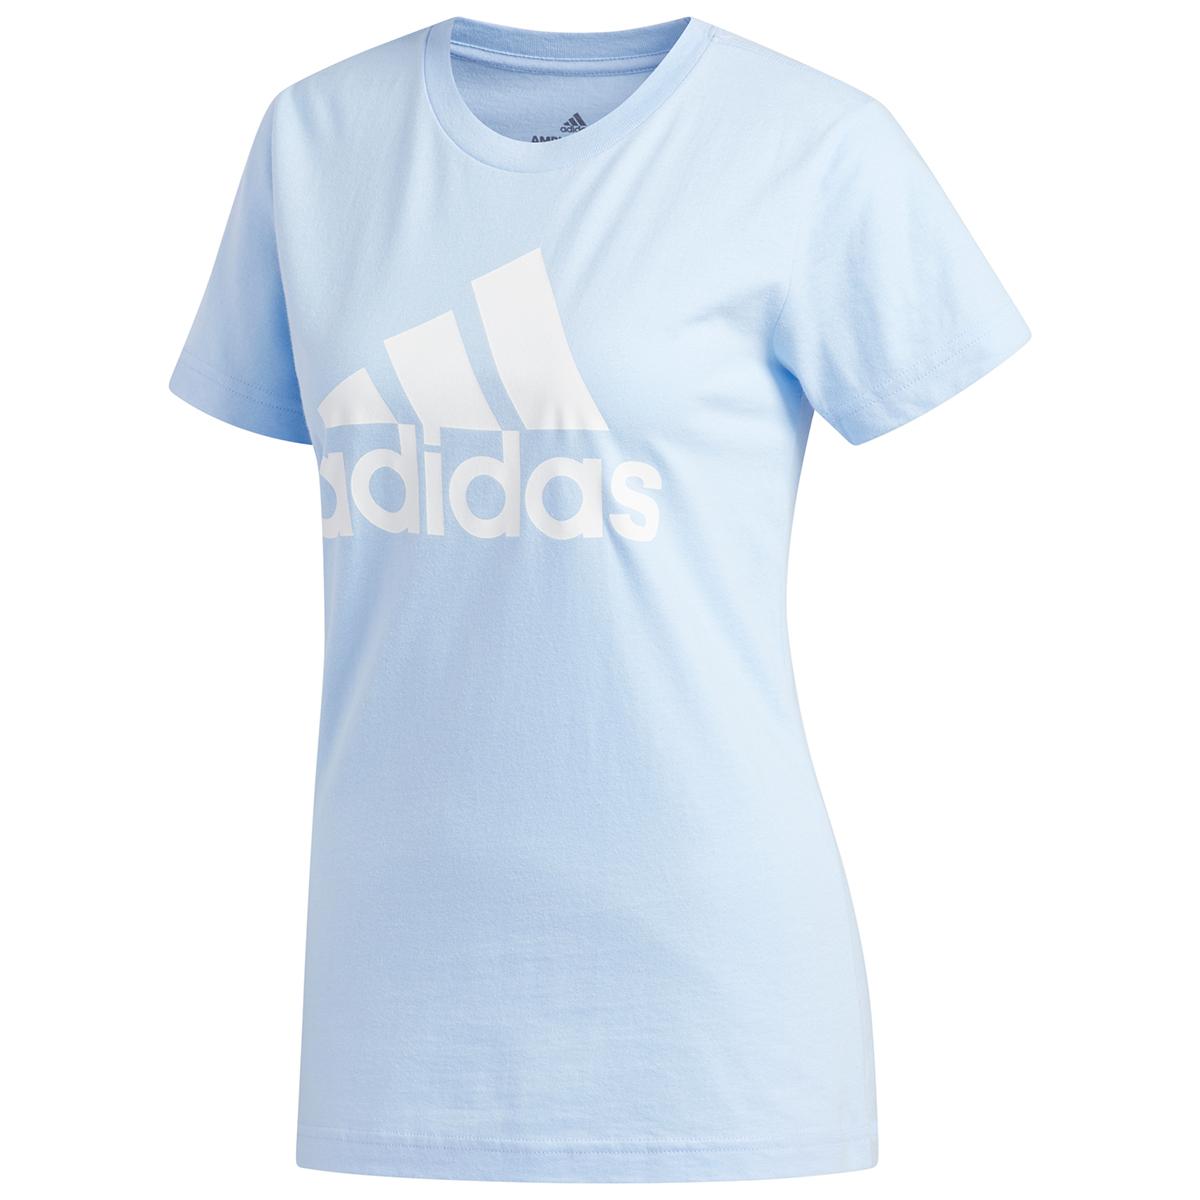 Adidas Women's Short-Sleeve Badge Of Sport Tee - Blue, L